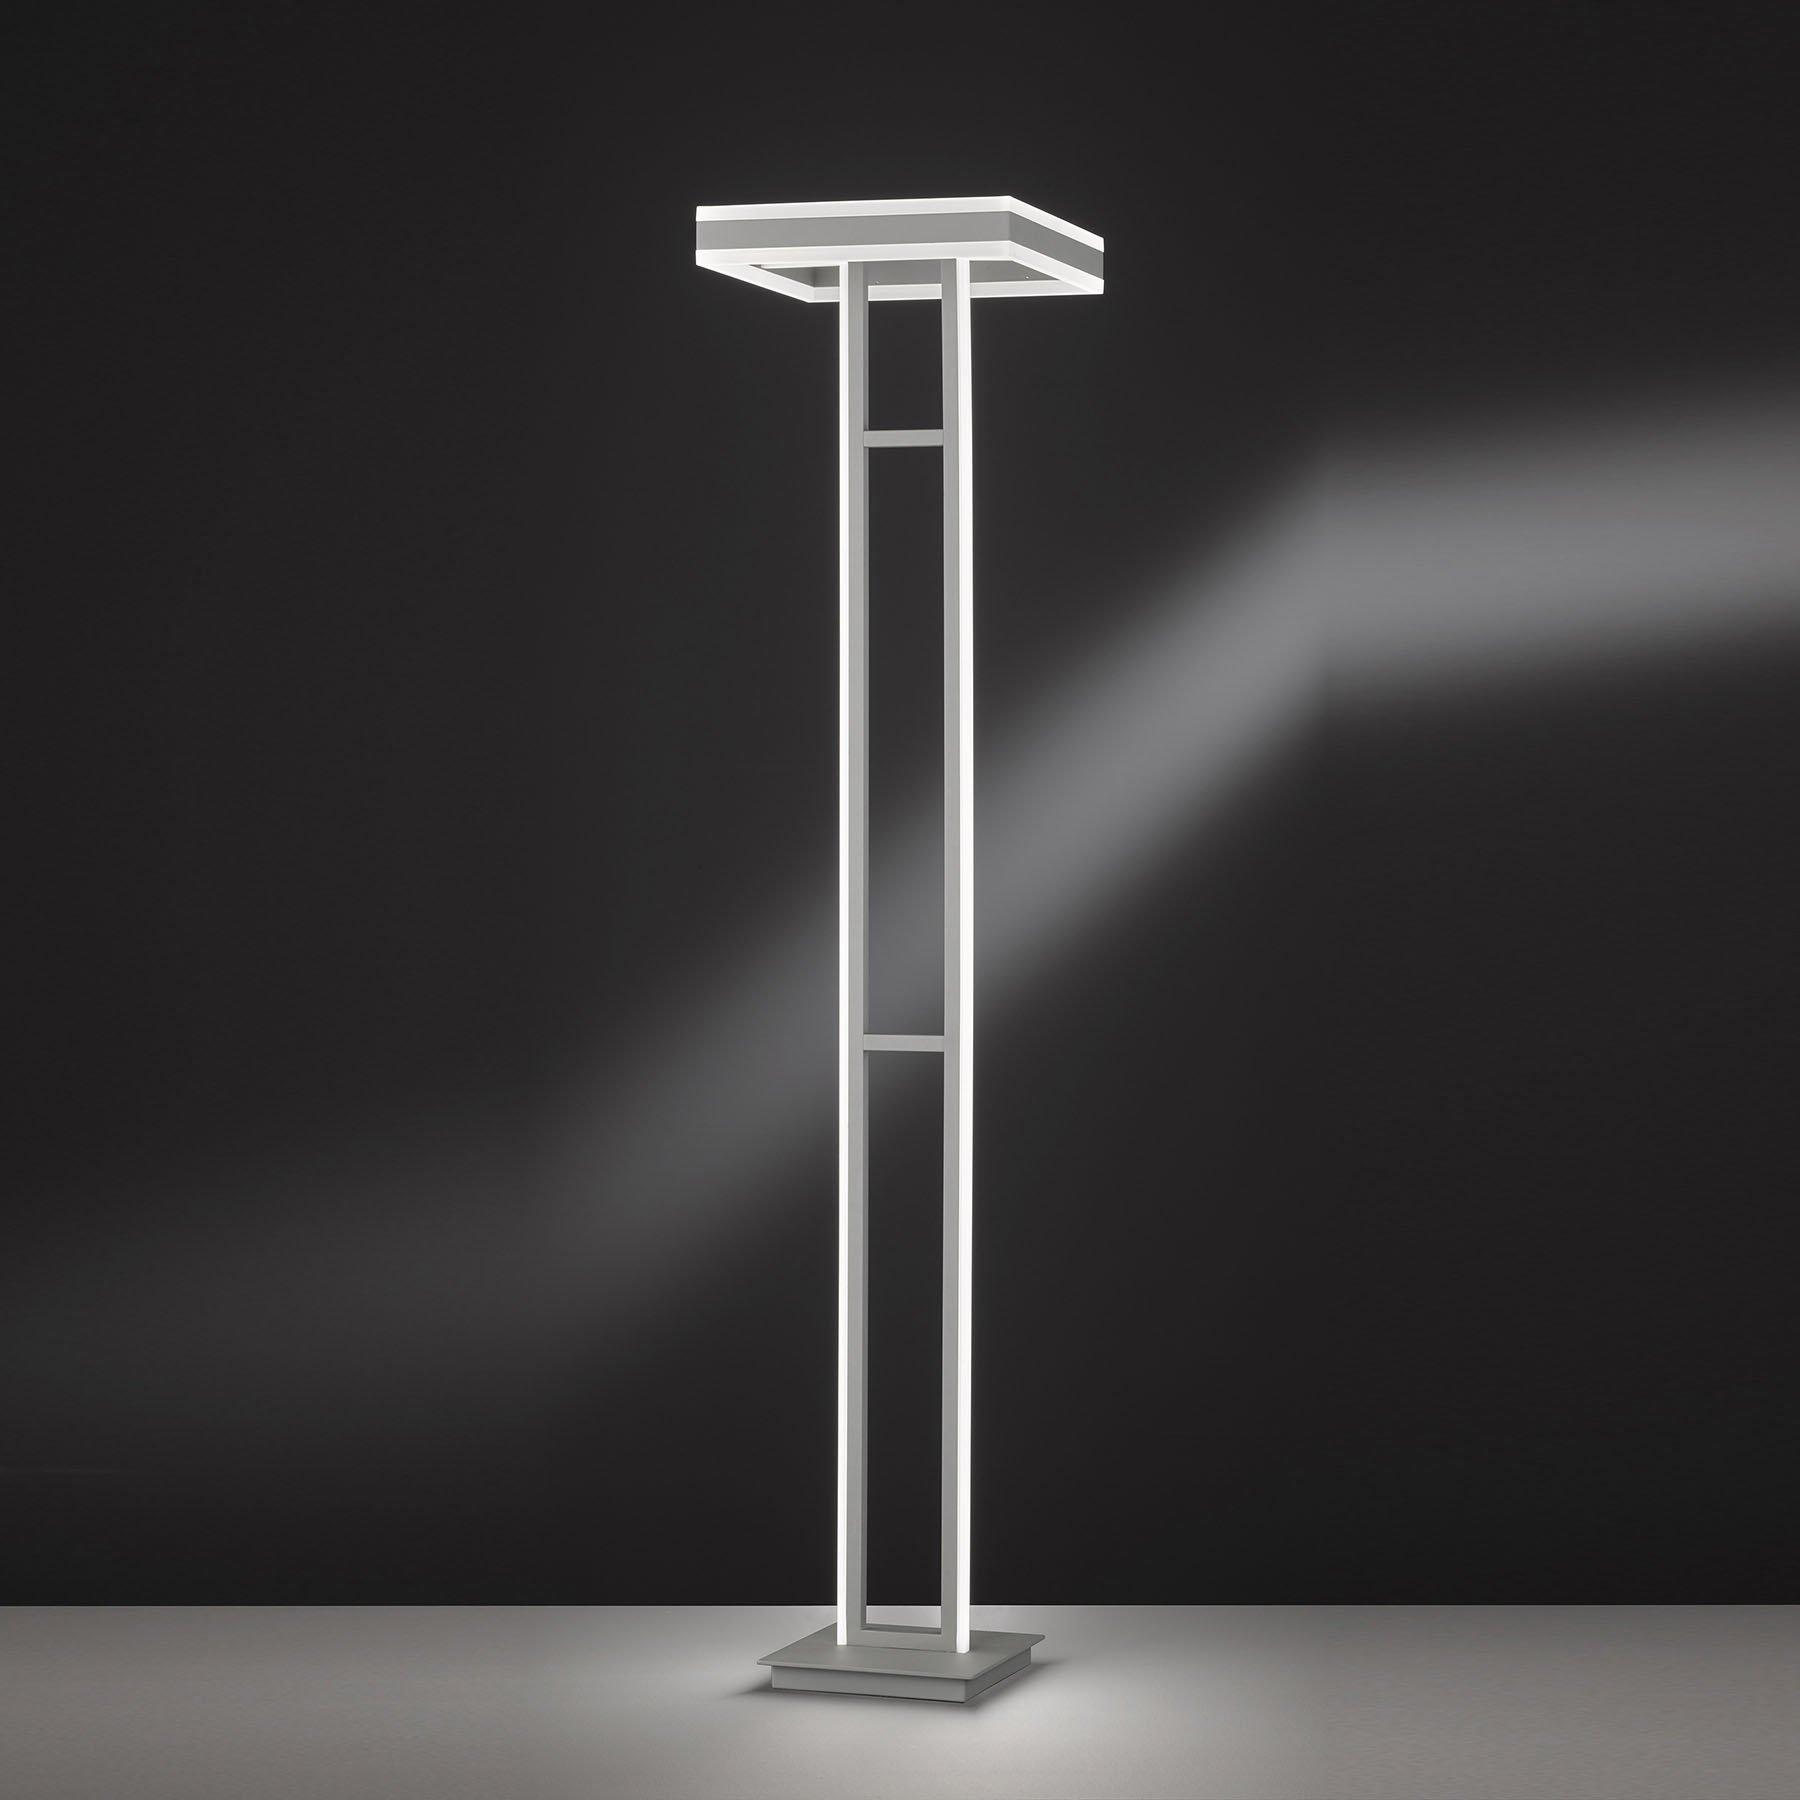 LED-gulvlampe Kemi med fjernkontroll, kantet